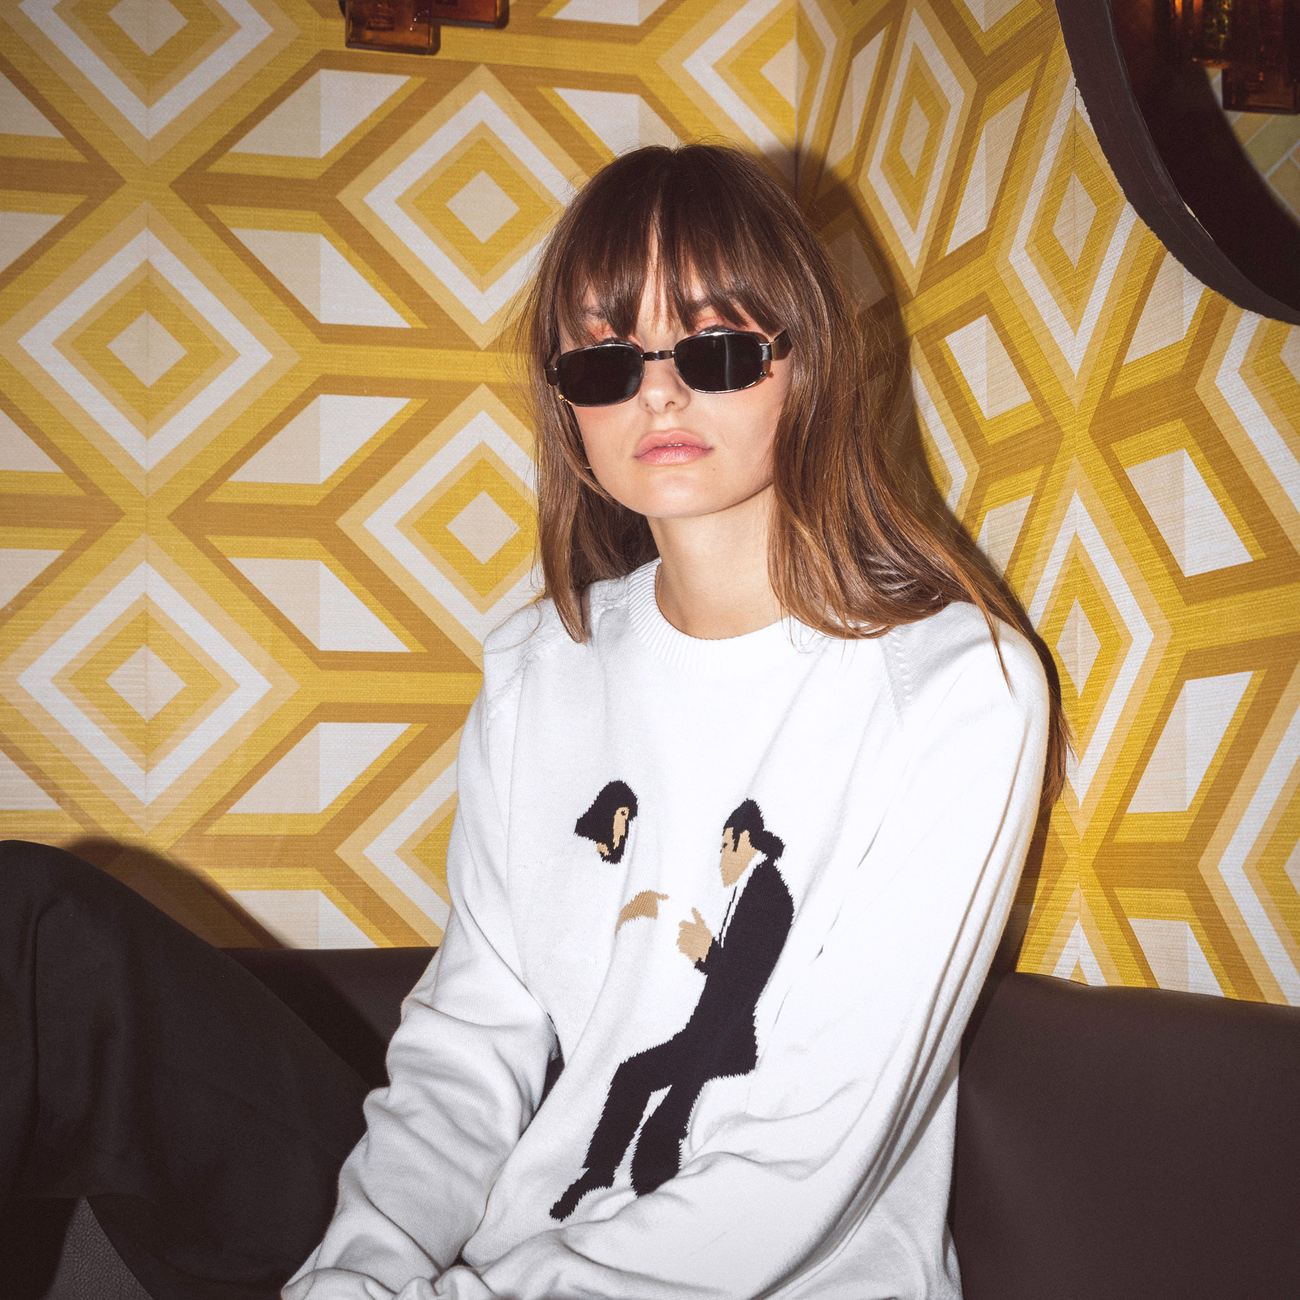 Sweater Arendal Pulp Fiction Dance